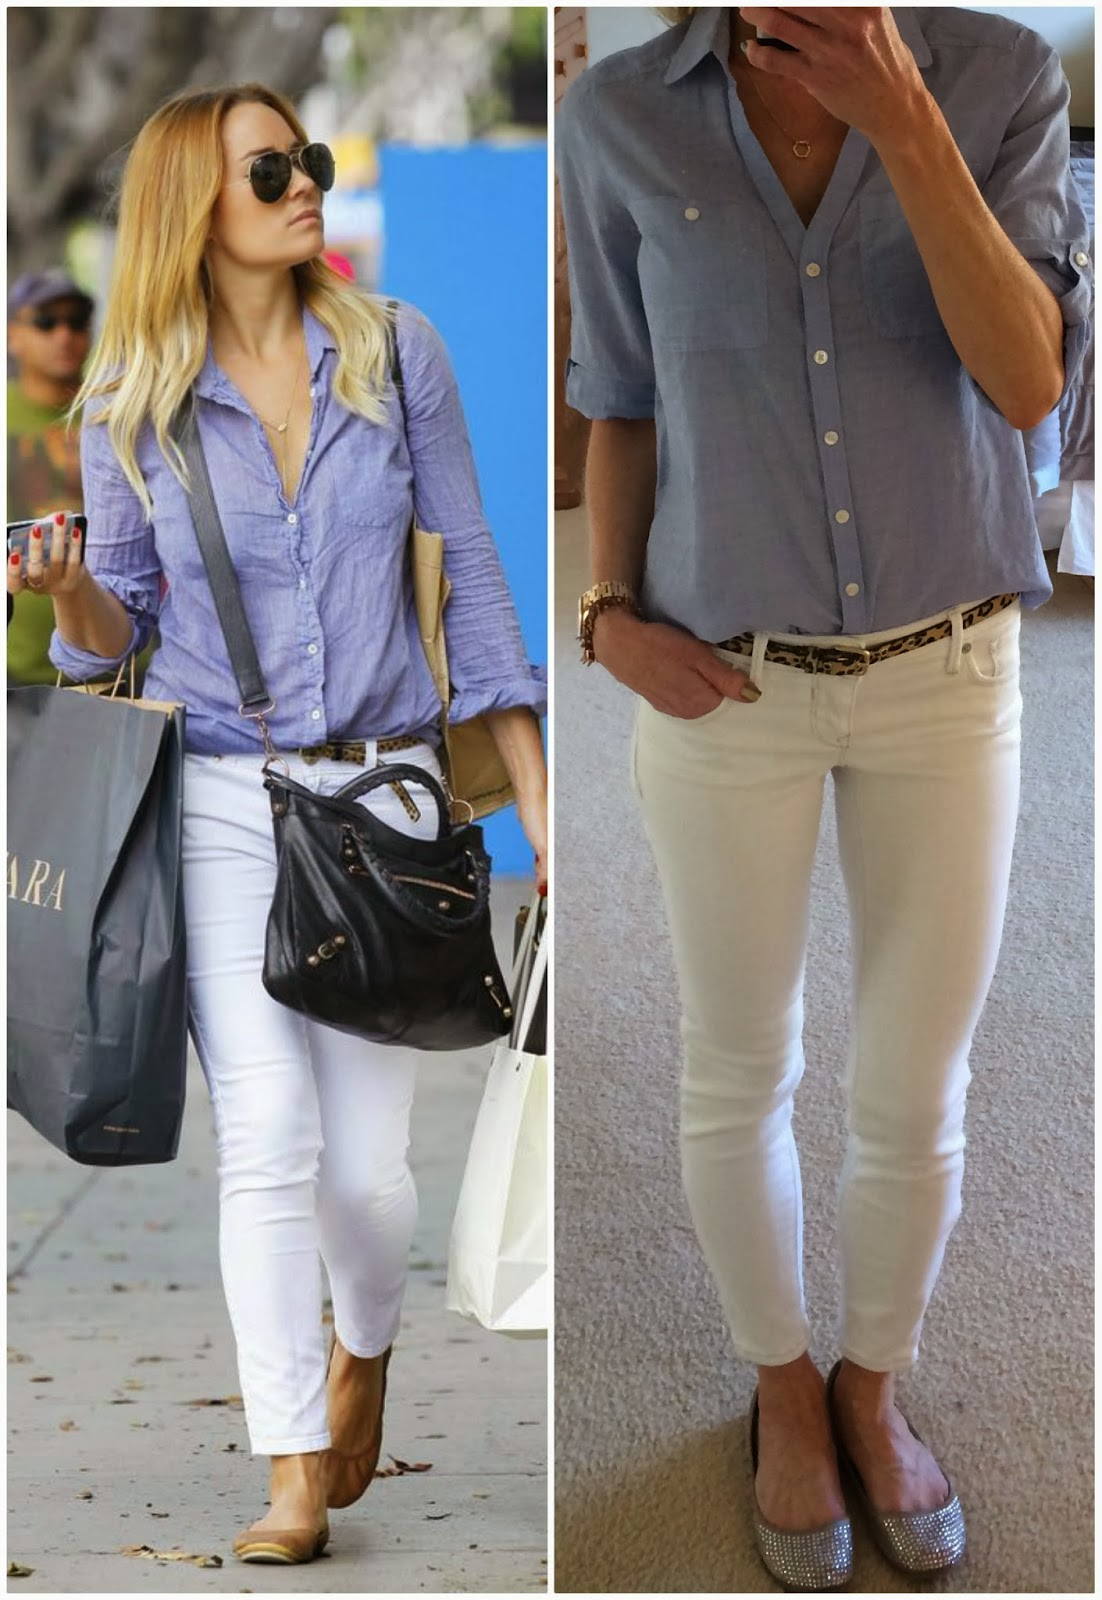 Lauren Conrad duplicate outfit, copycat look, Express ankle zip jean legging, white jeans, blue blouse